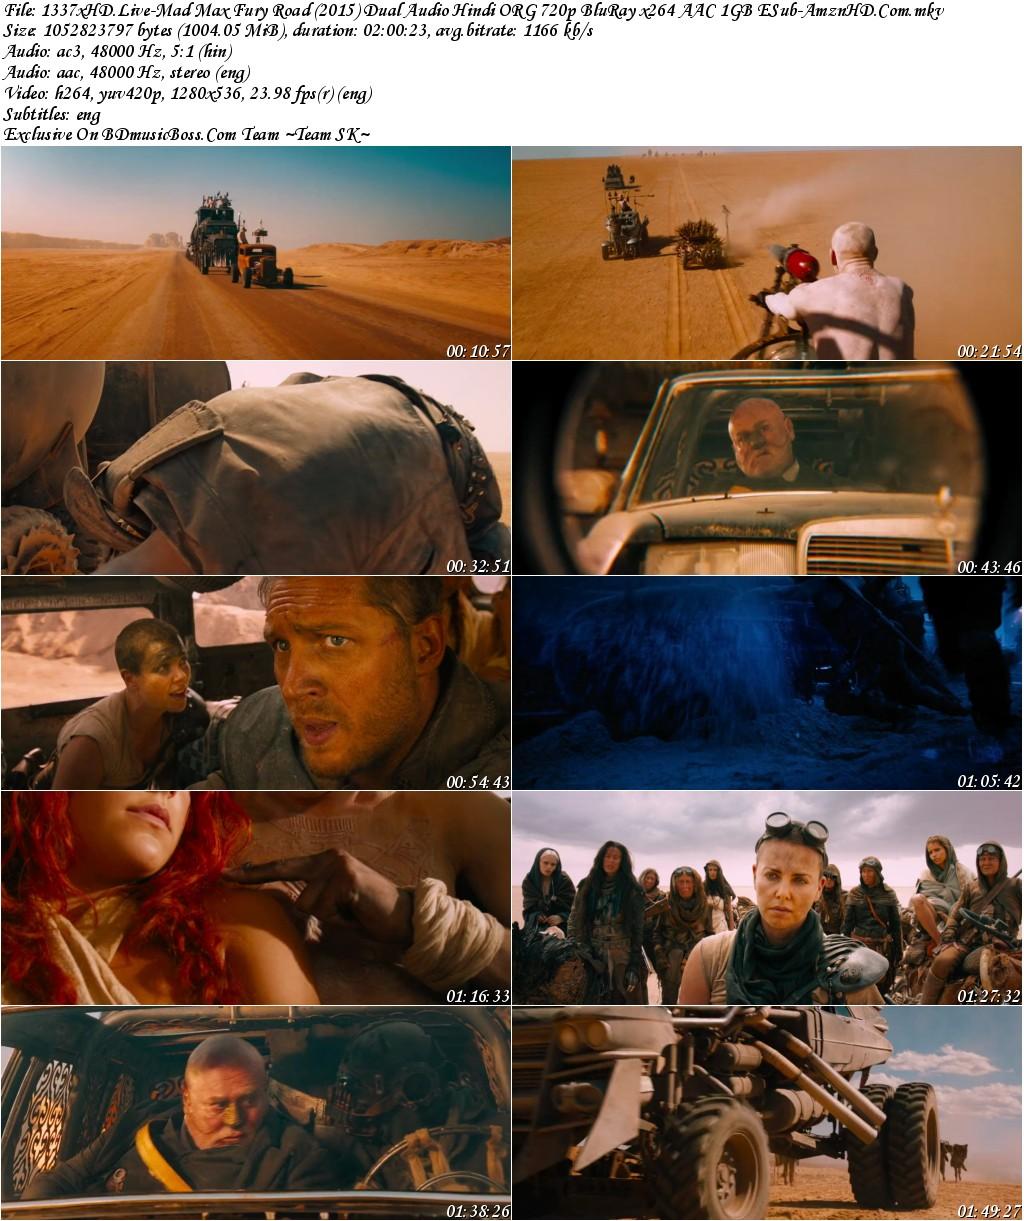 1337x-HD-Live-Mad-Max-Fury-Road-2015-Dual-Audio-Hindi-ORG-720p-Blu-Ray-x264-AAC-1-GB-ESub-Amzn-HD-Co